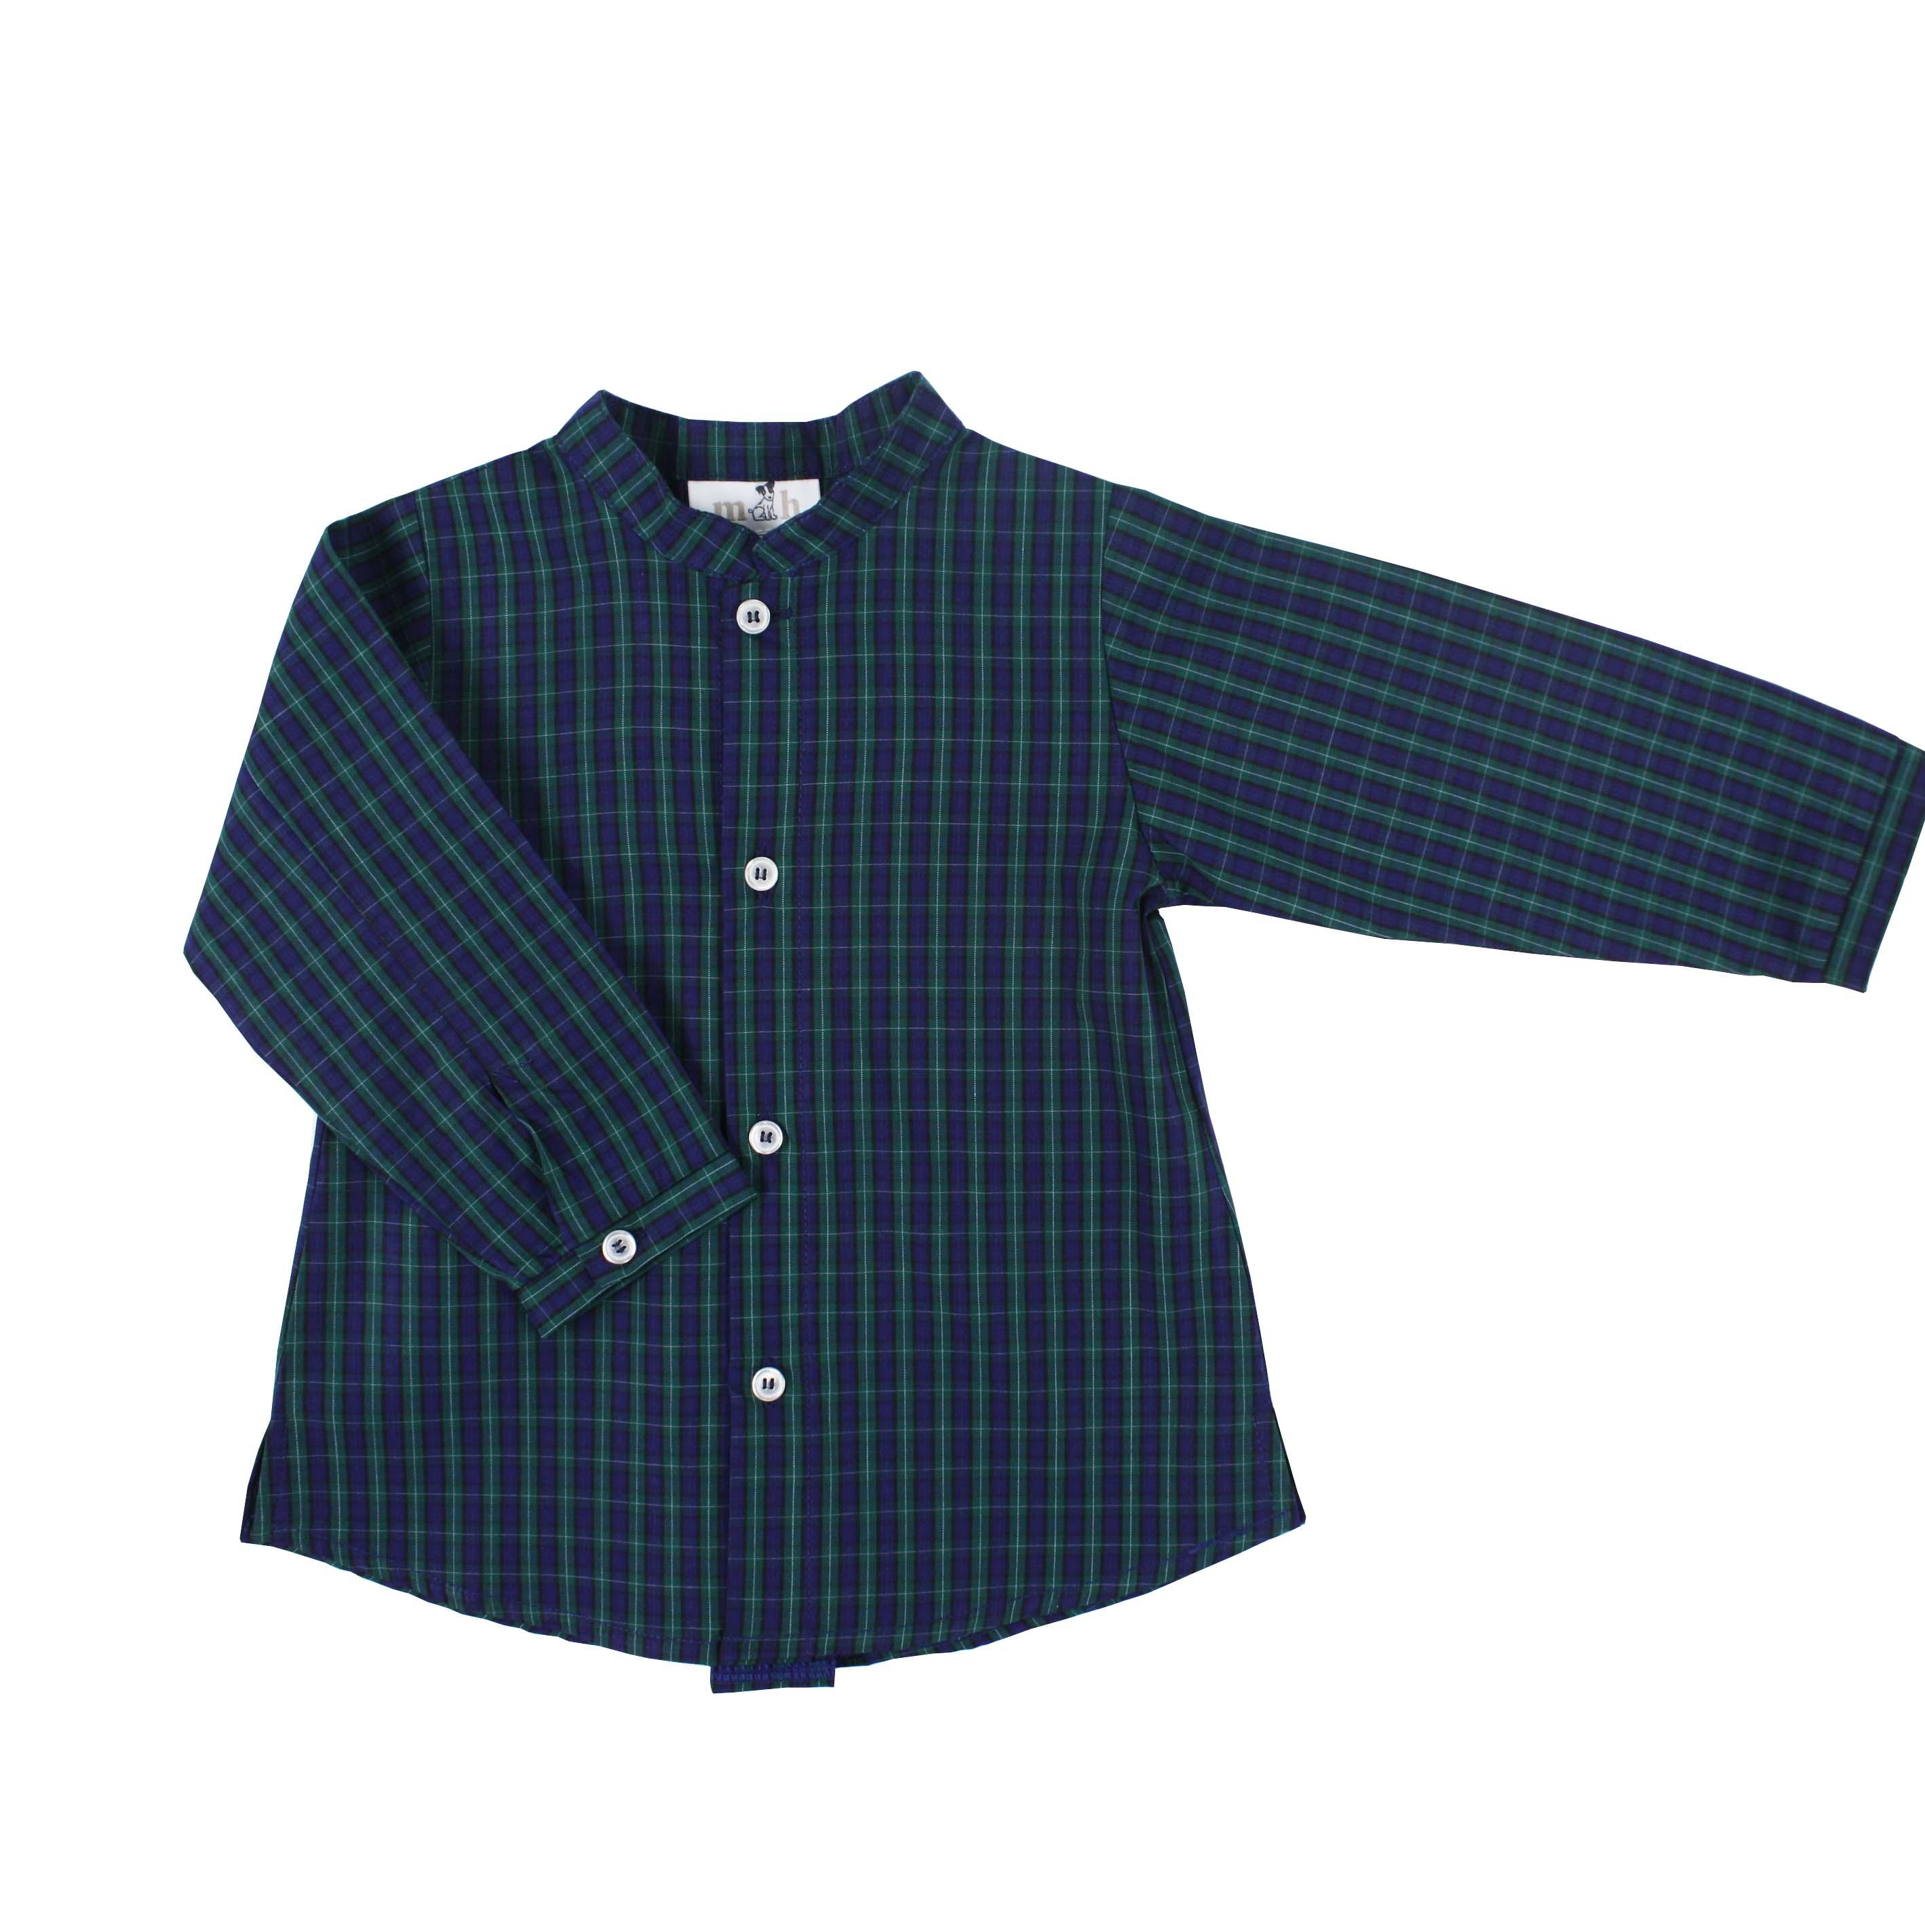 182db46e62 Camisa manga larga cuadro escocés verde y marino cuello mao. camisa niño  cuello mao escocés